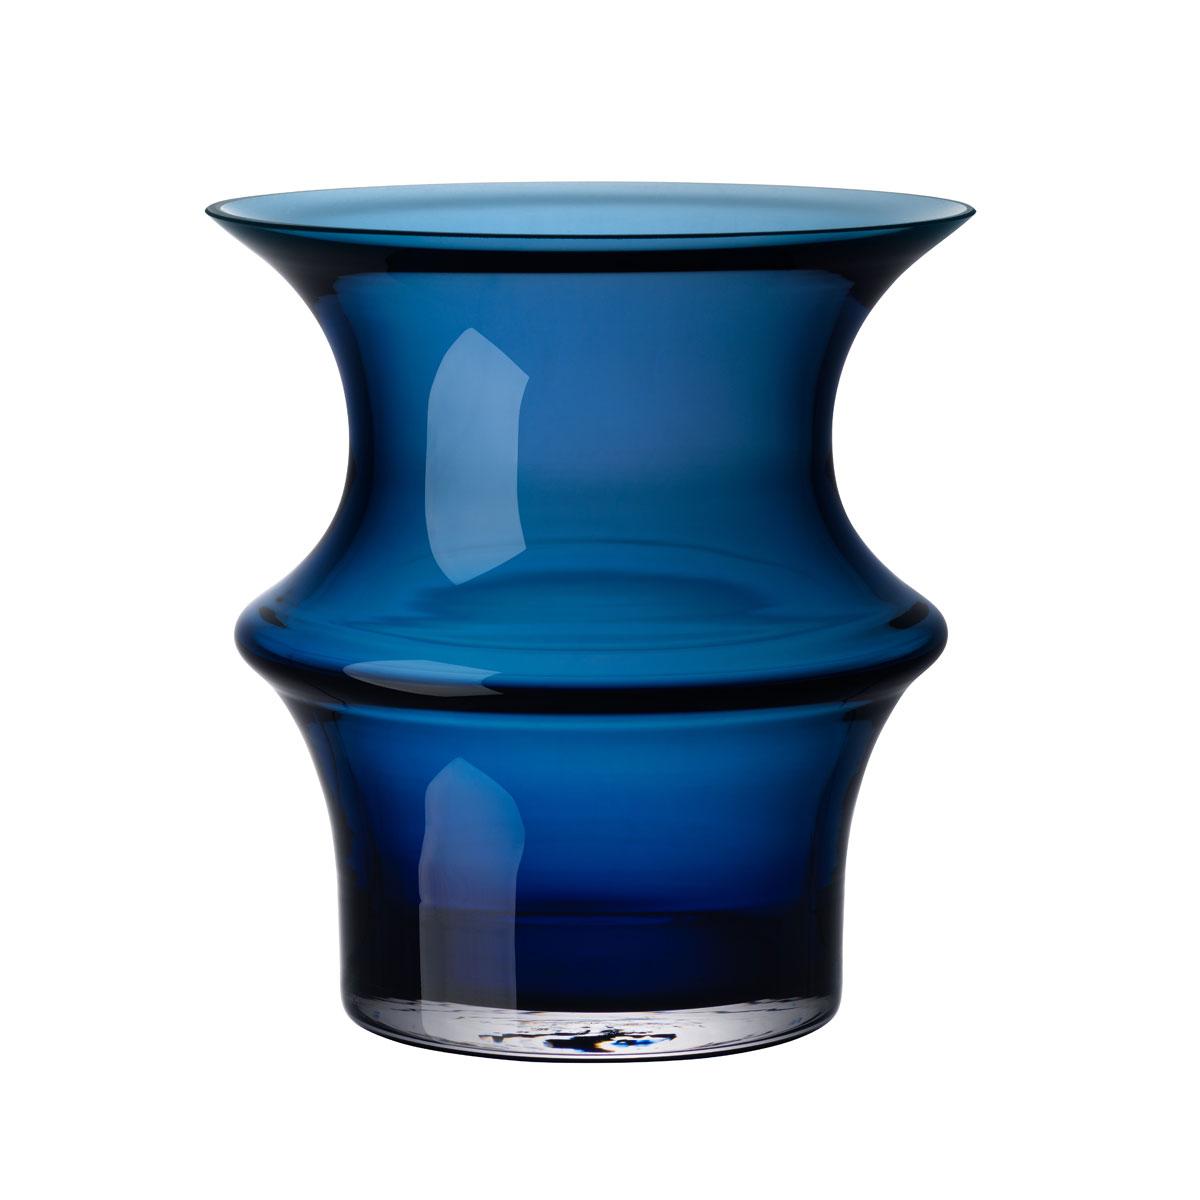 Kosta Boda Pagod Small Vase, Petrol Blue